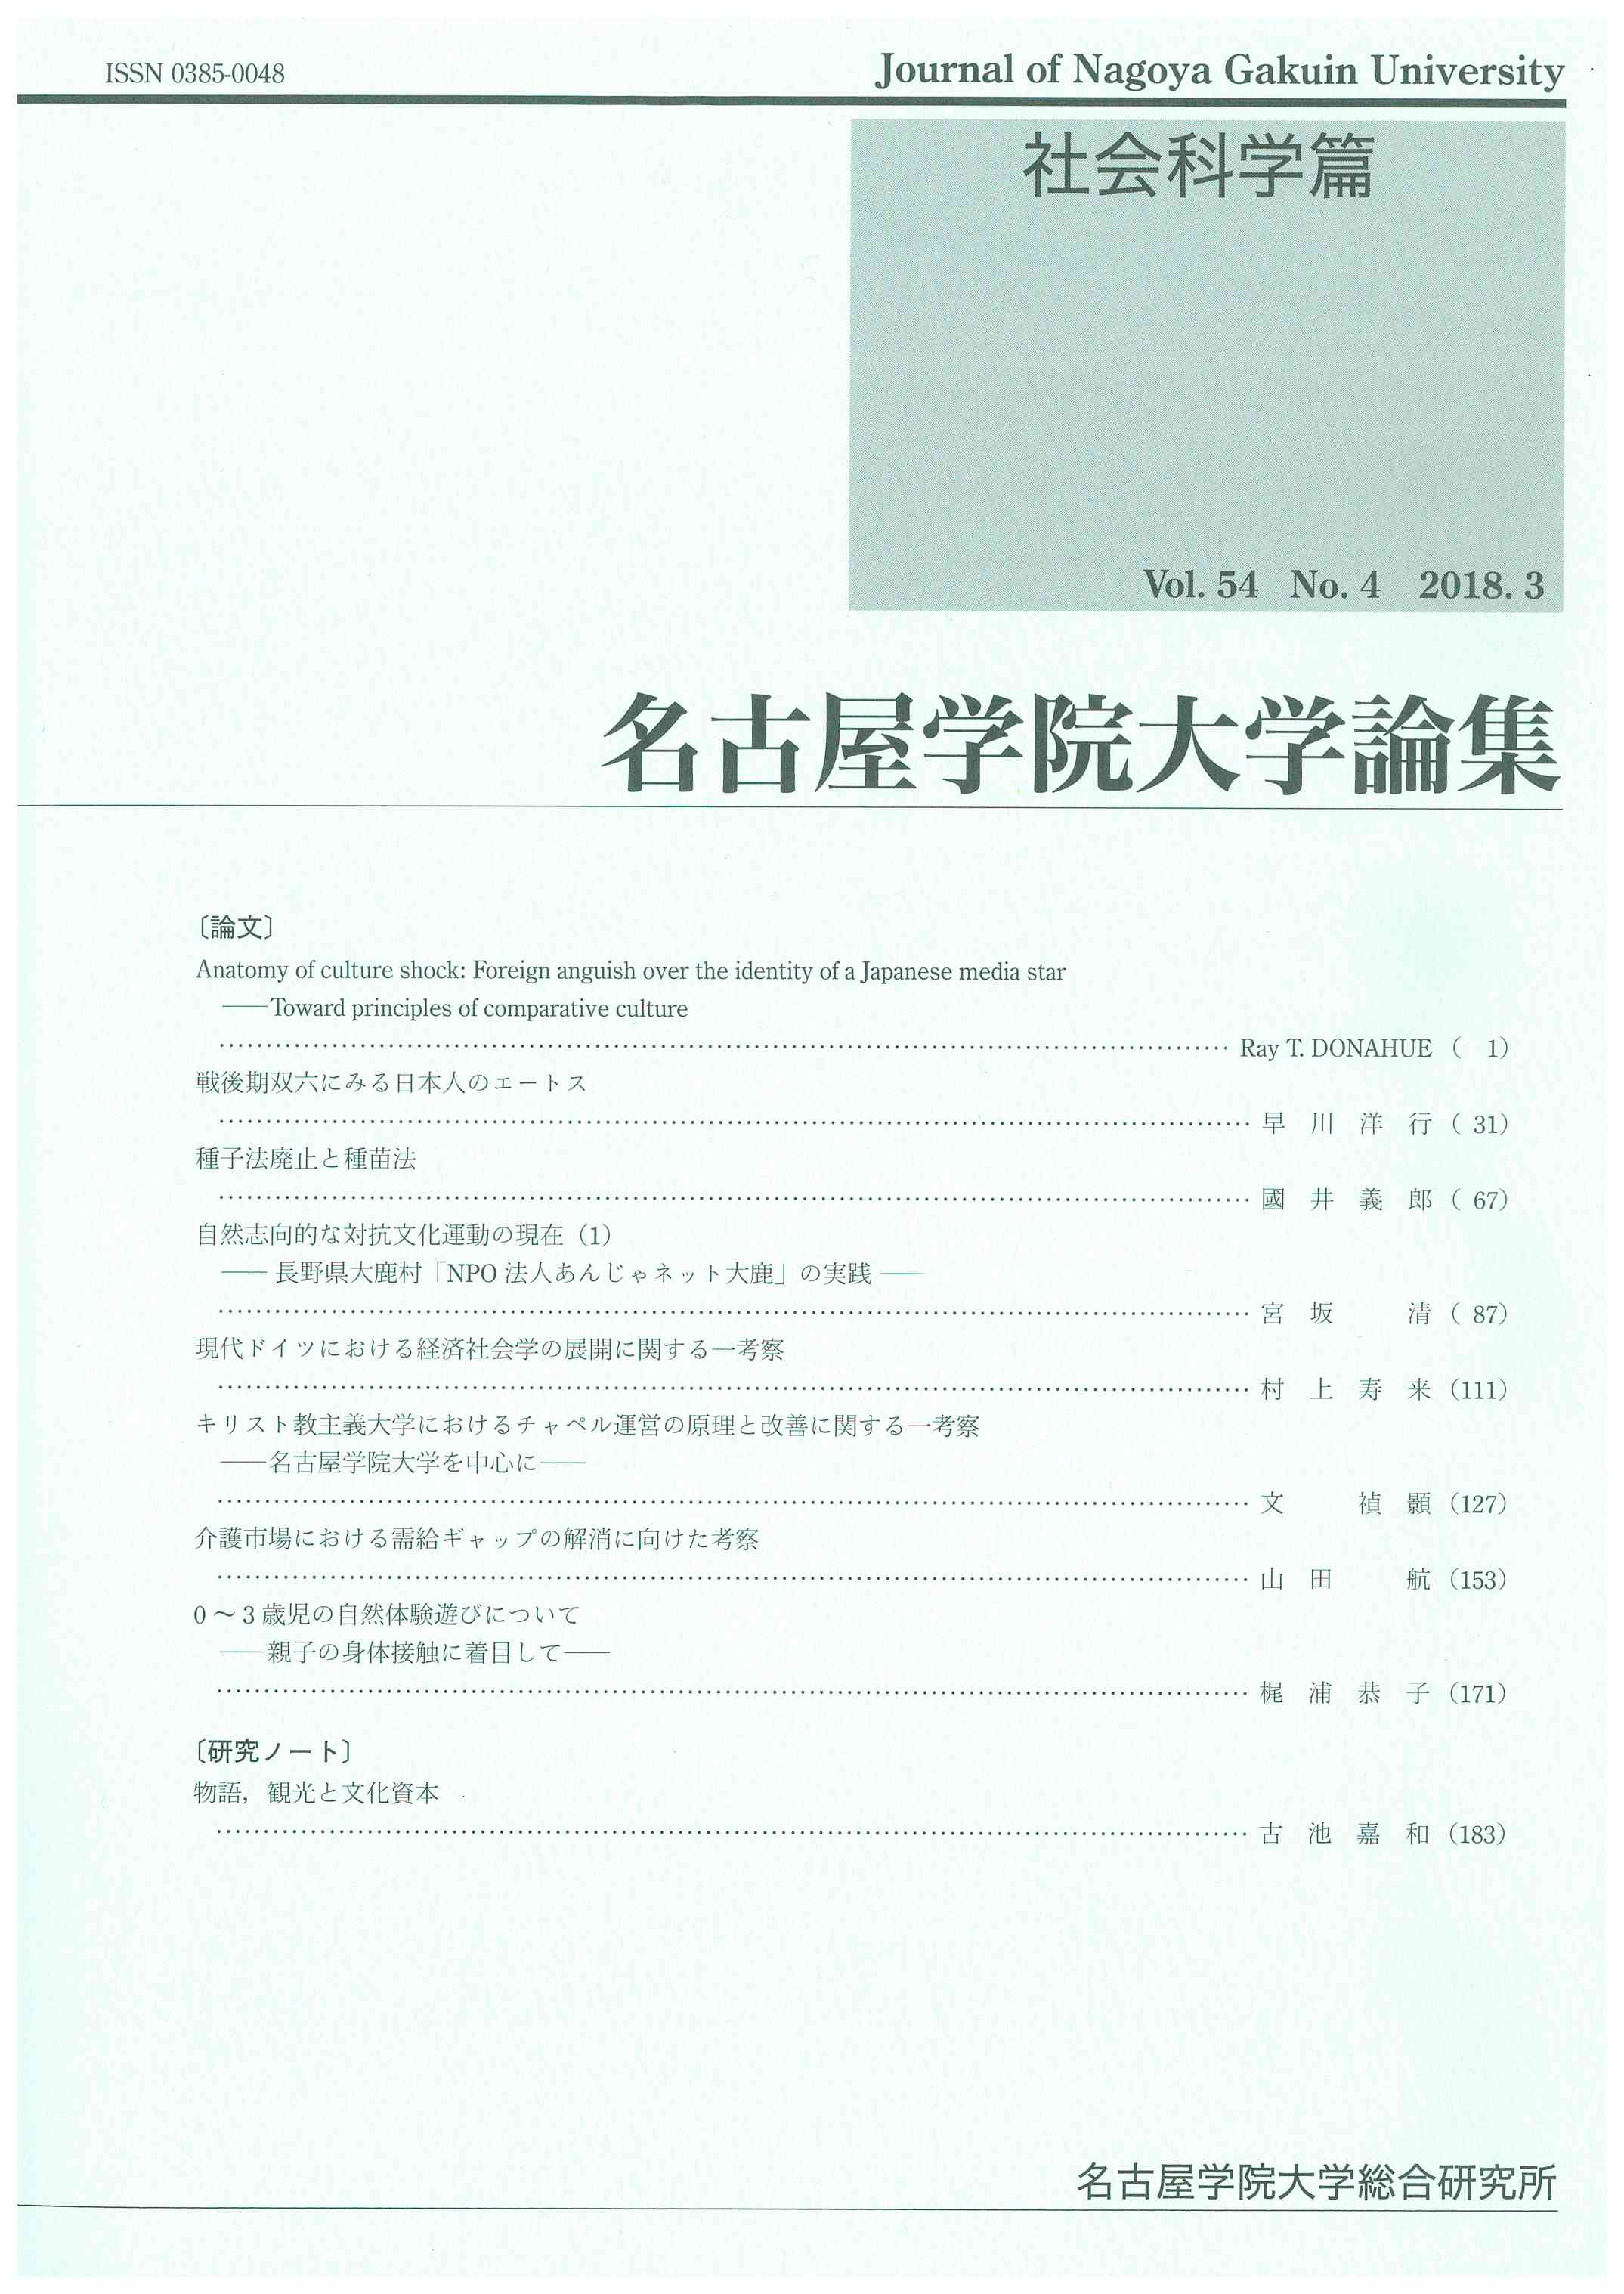 shakai54-4.jpg